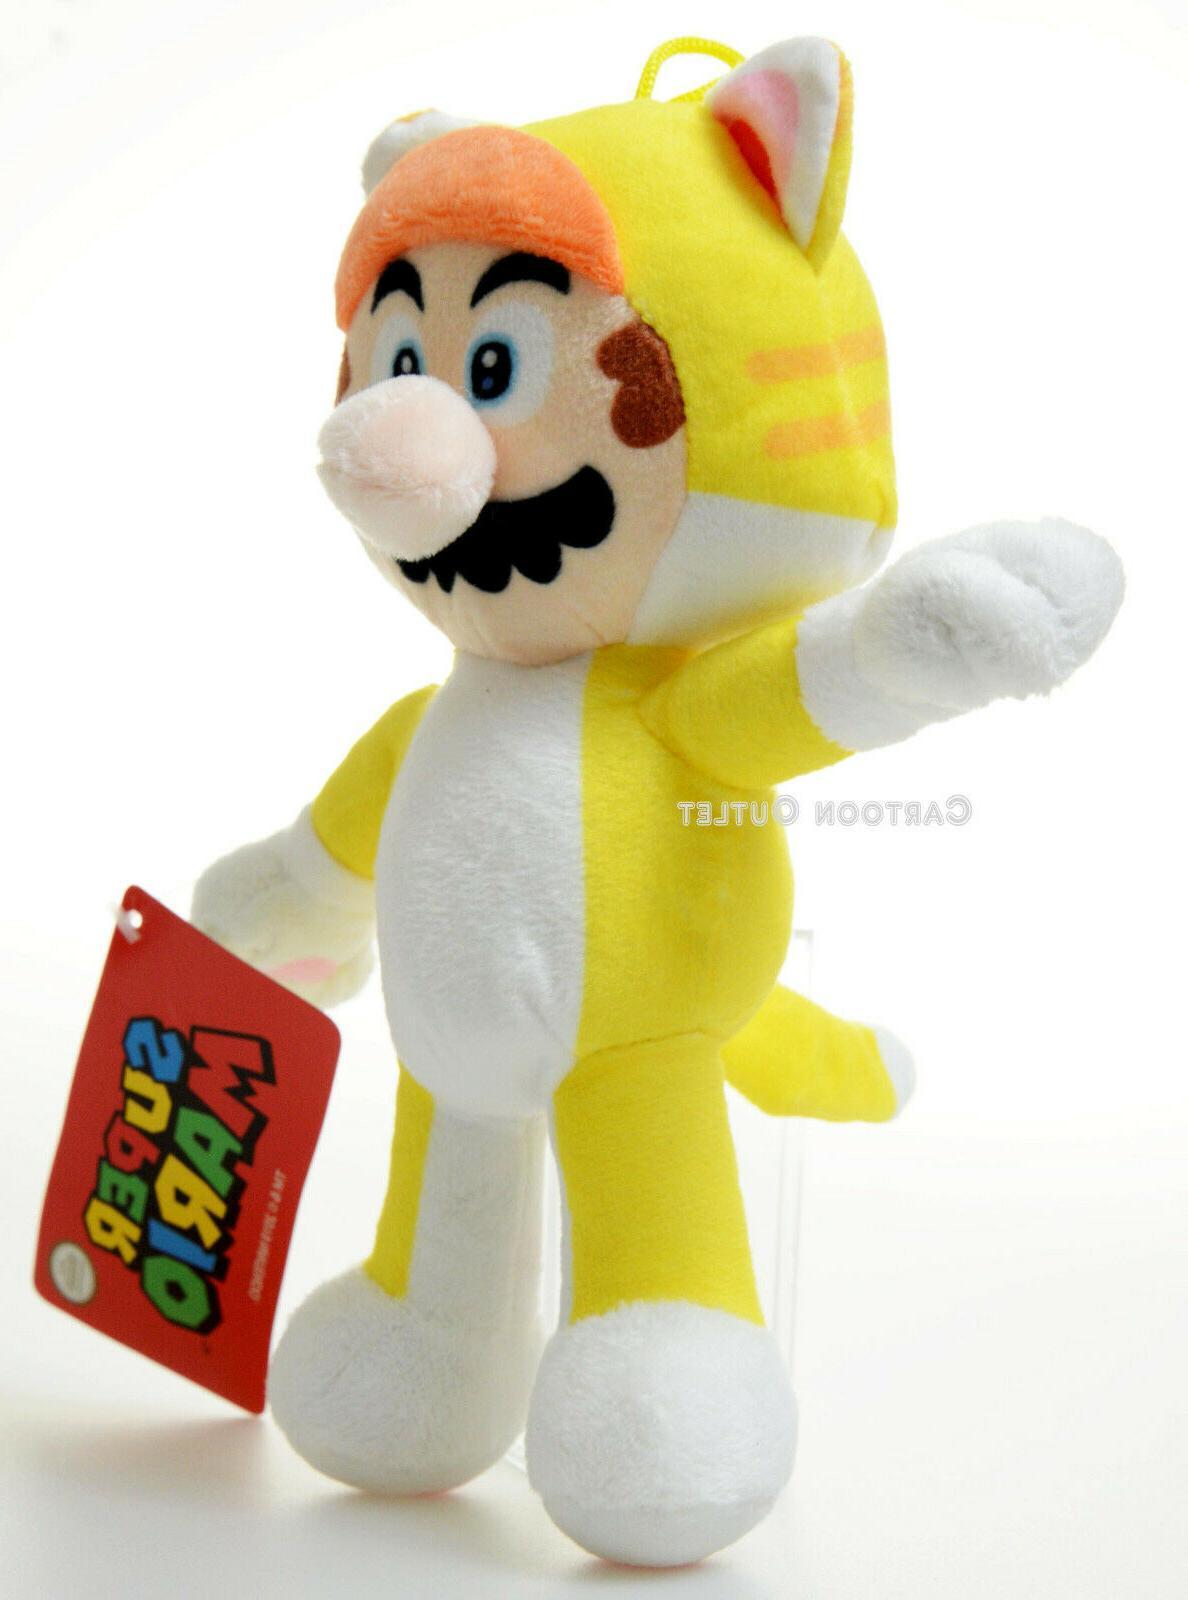 Super Mario 8 Tanooki Stuffed Plush Doll Toy Costume Birthday Gift